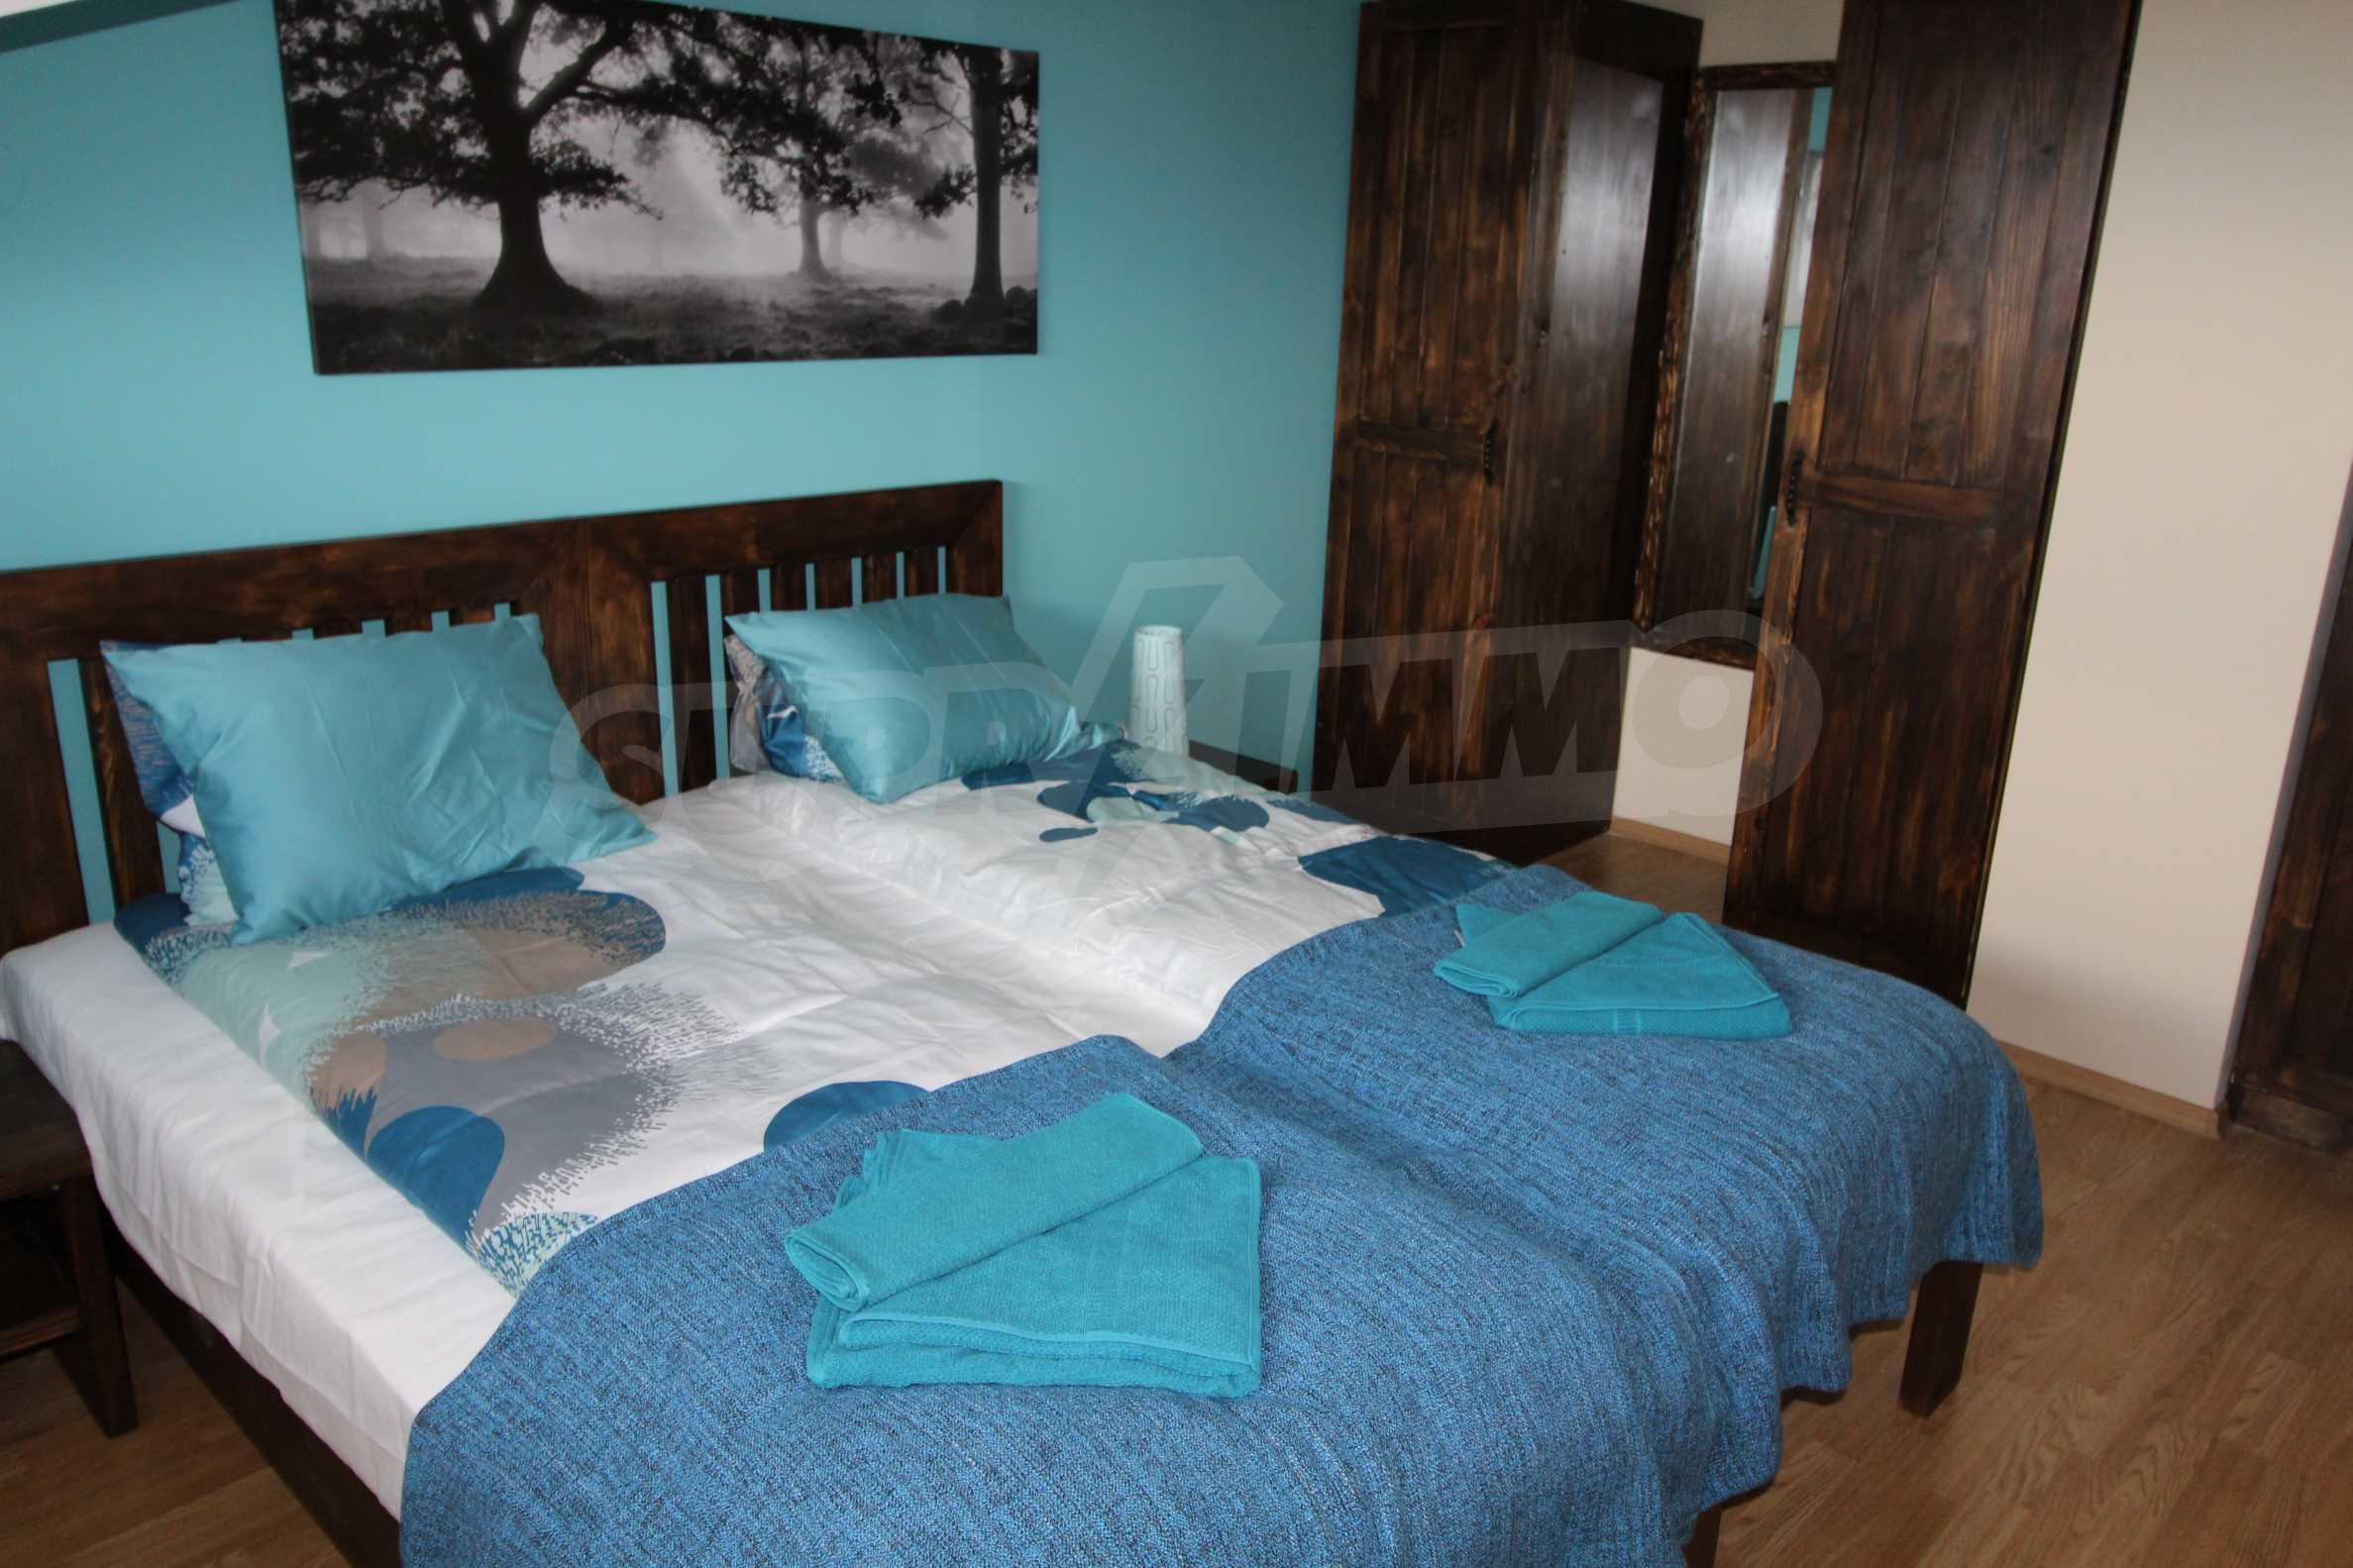 Стилен апартамент в близост до ски курорта Банско 15